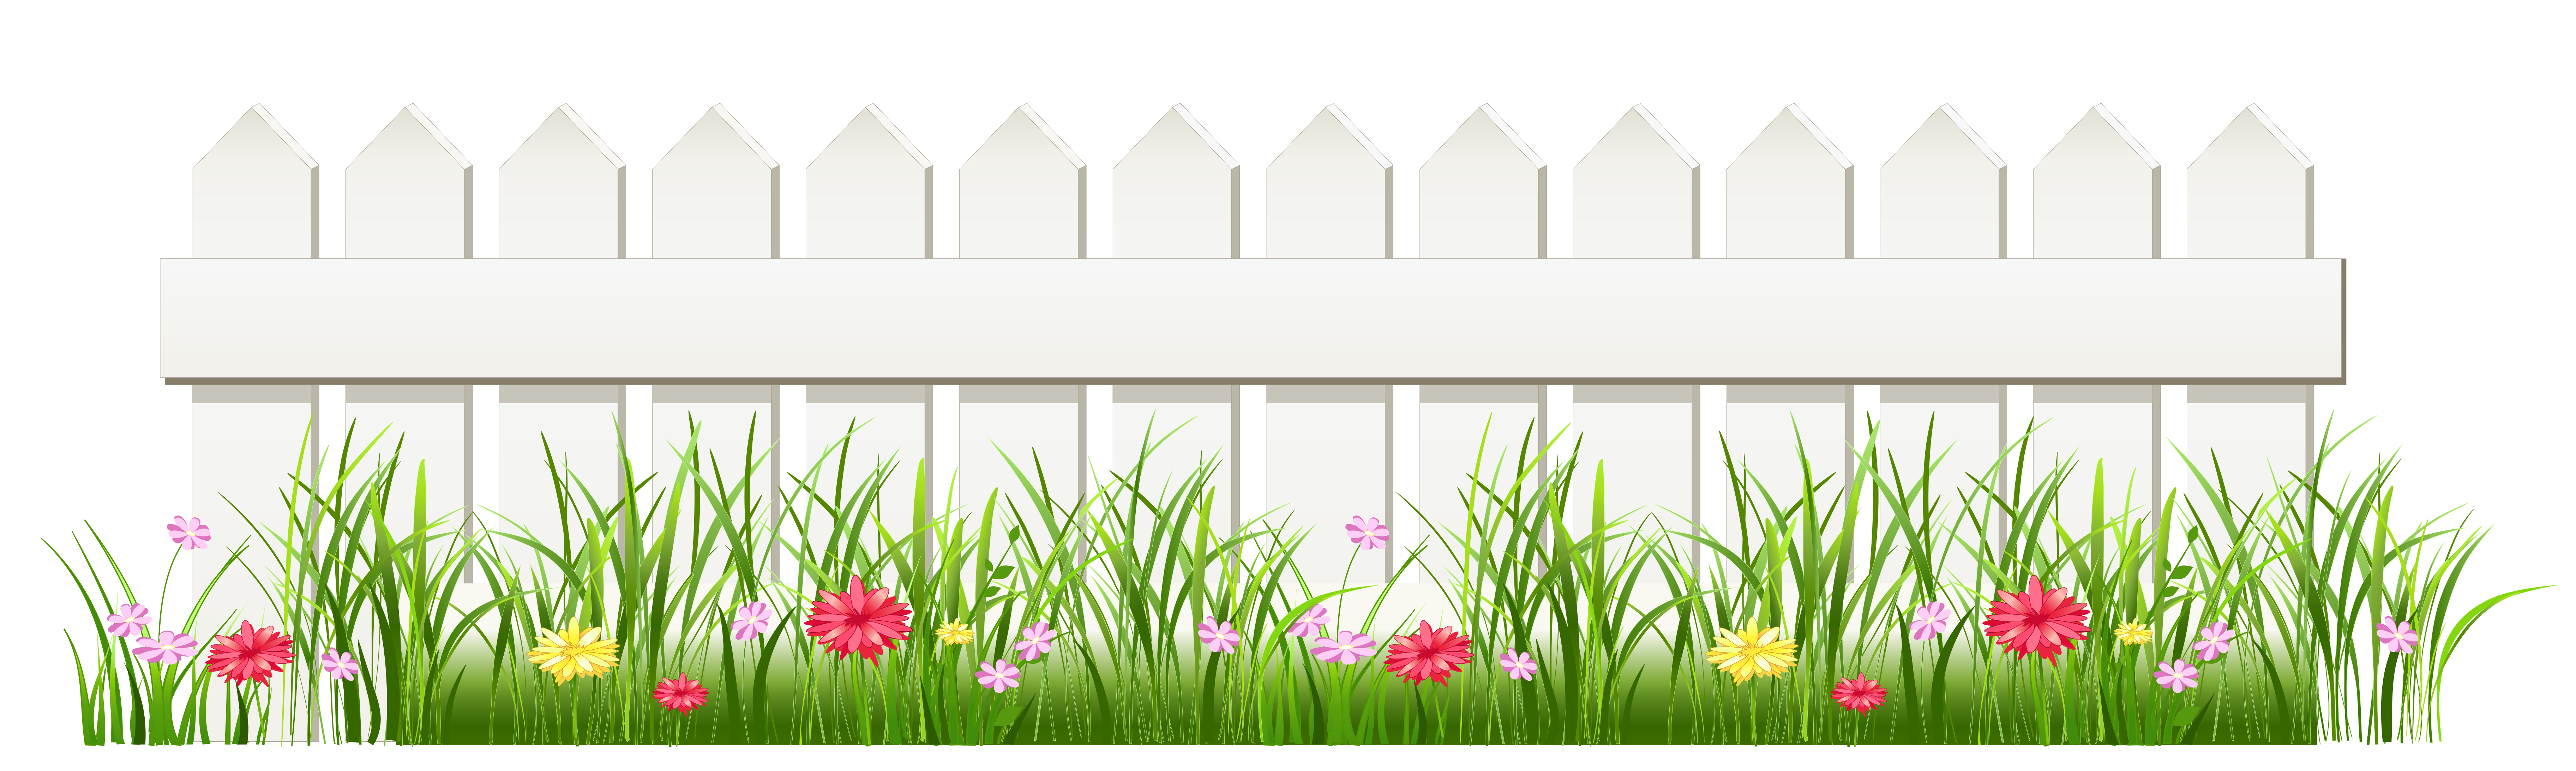 white fence grass derby backdrops superheroes clip art school stuff [ 7299 x 2186 Pixel ]